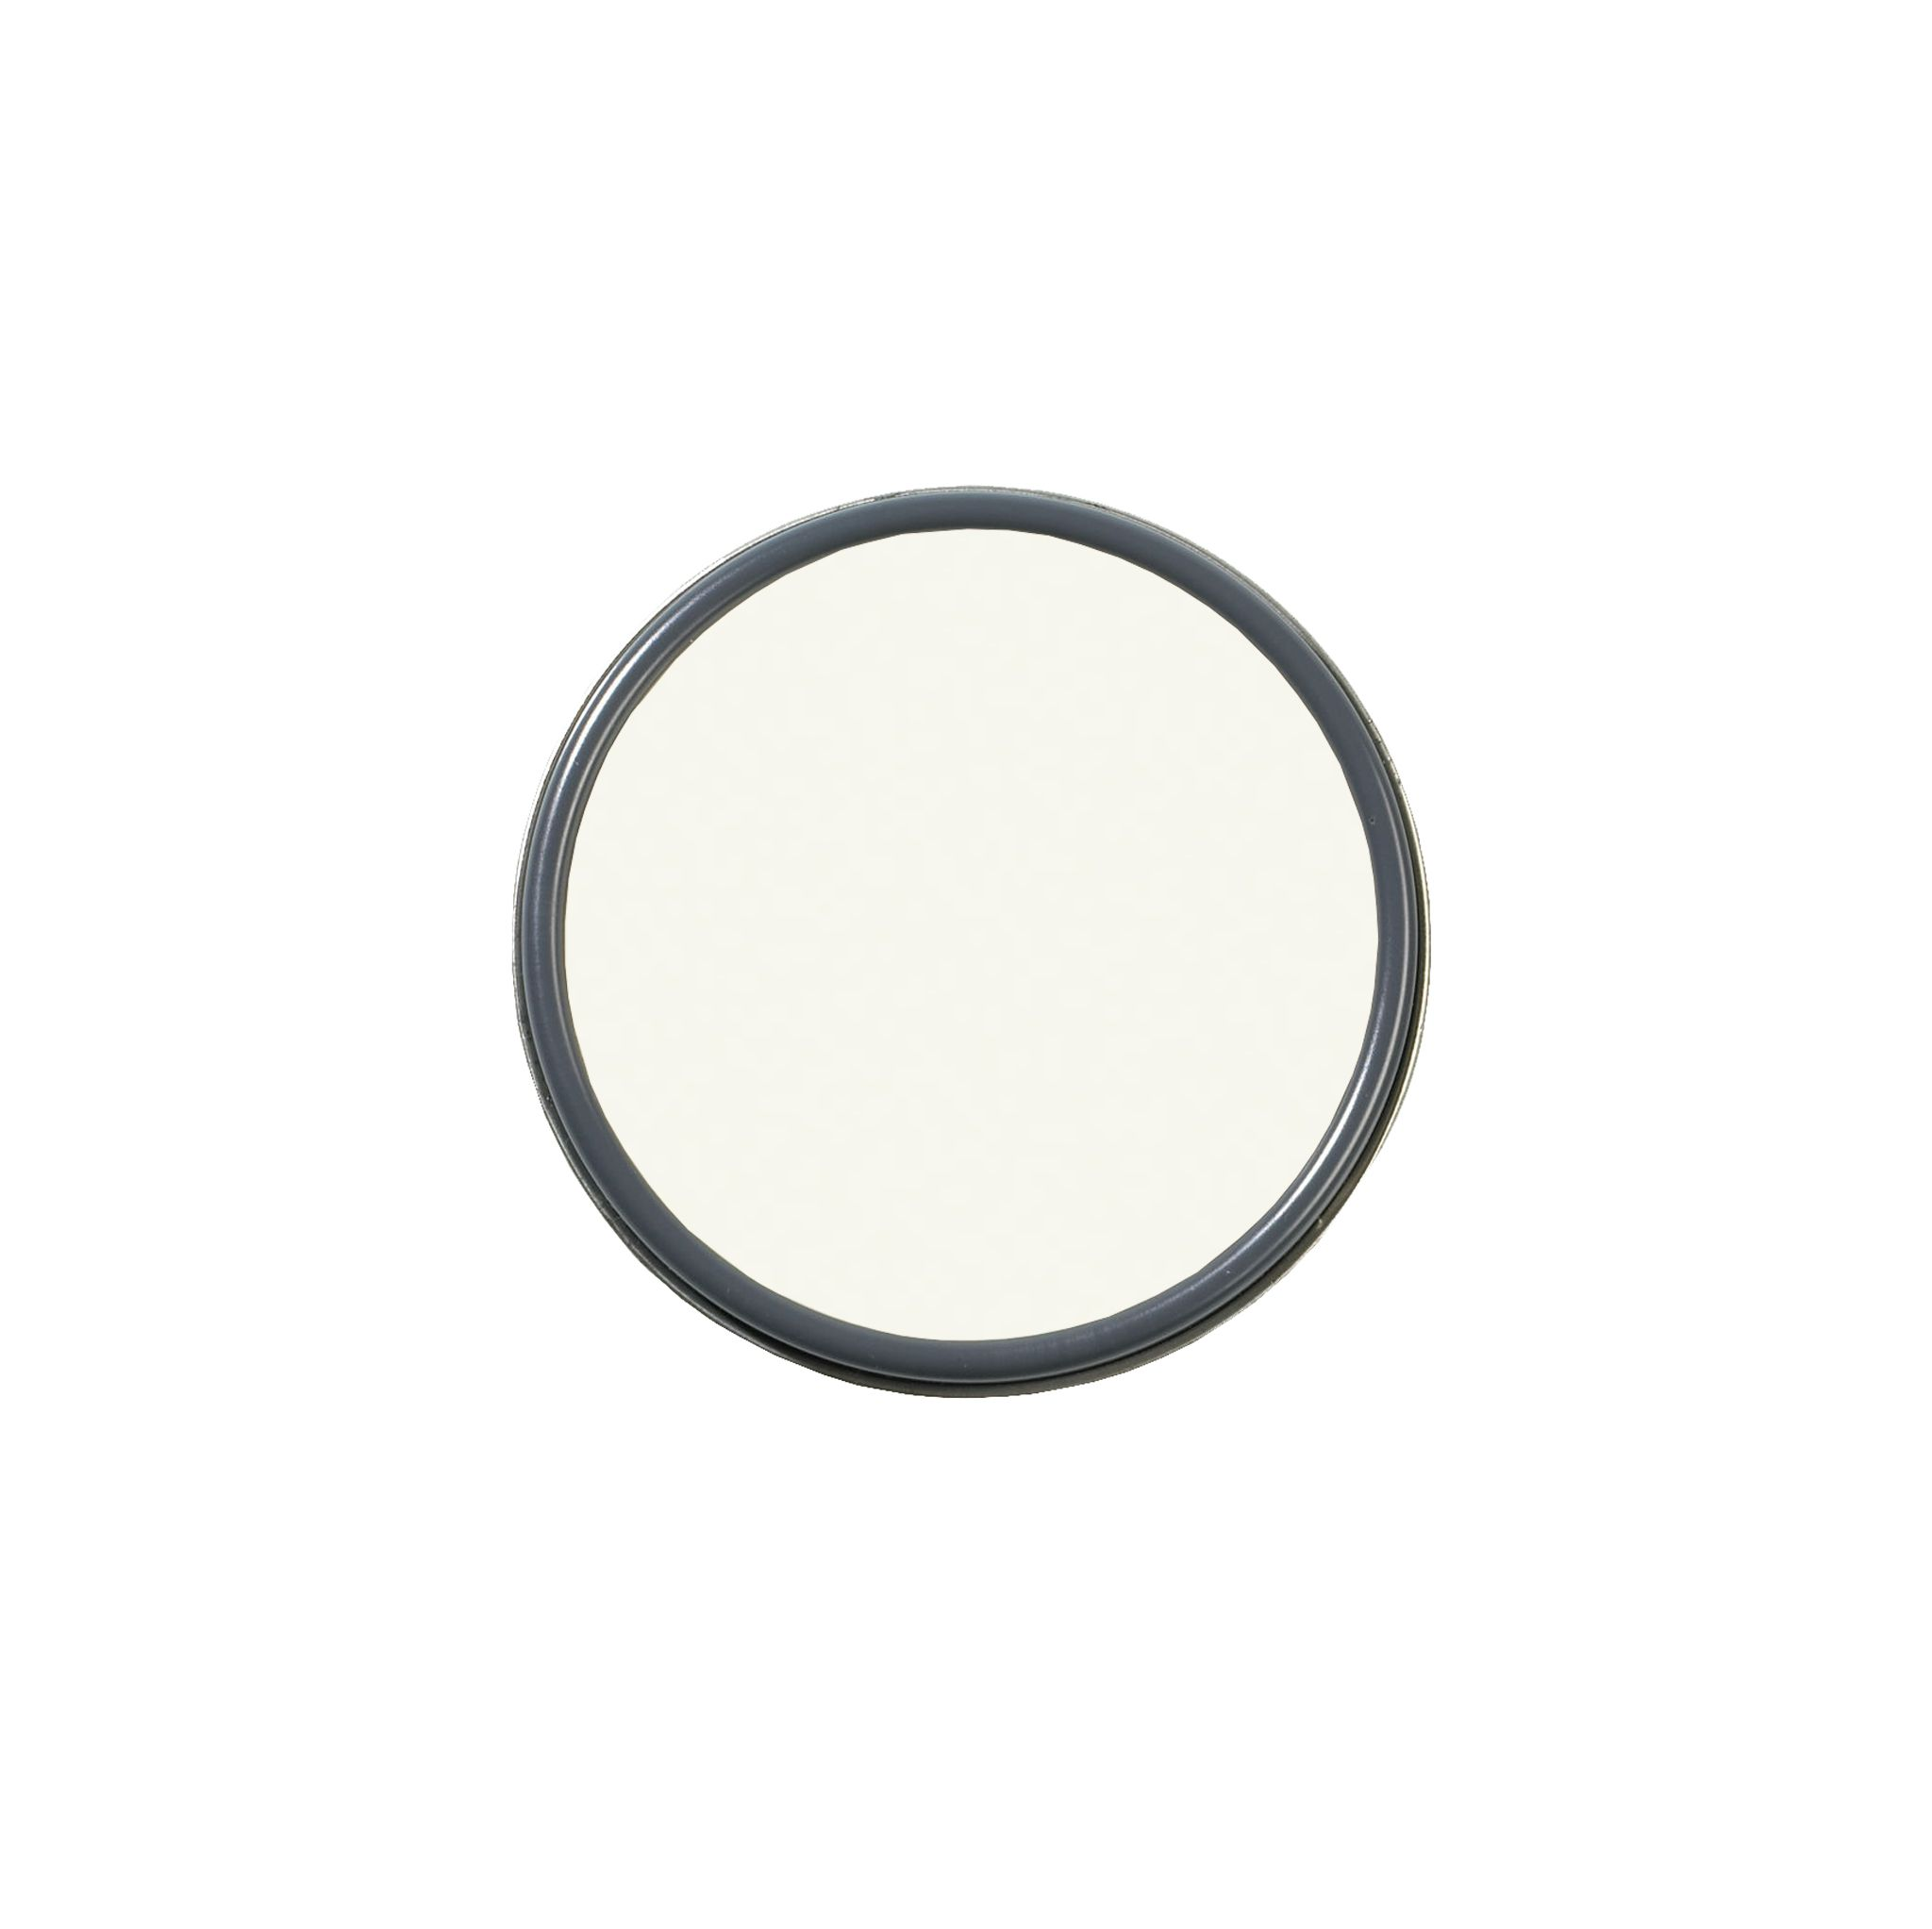 Benjamin Moore - Simple White